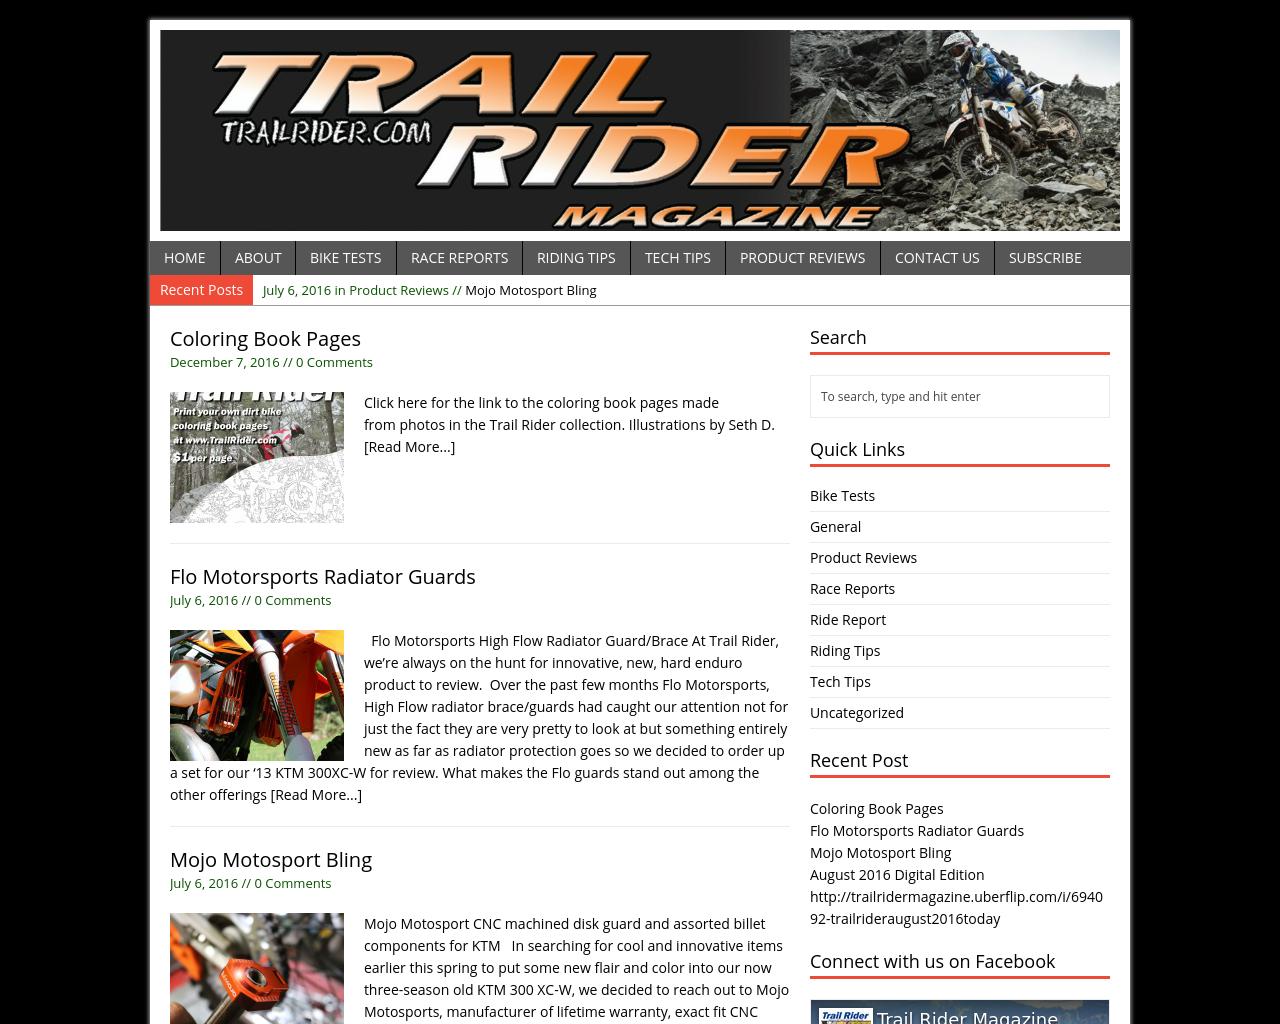 Trail-Rider-Magazine-Advertising-Reviews-Pricing